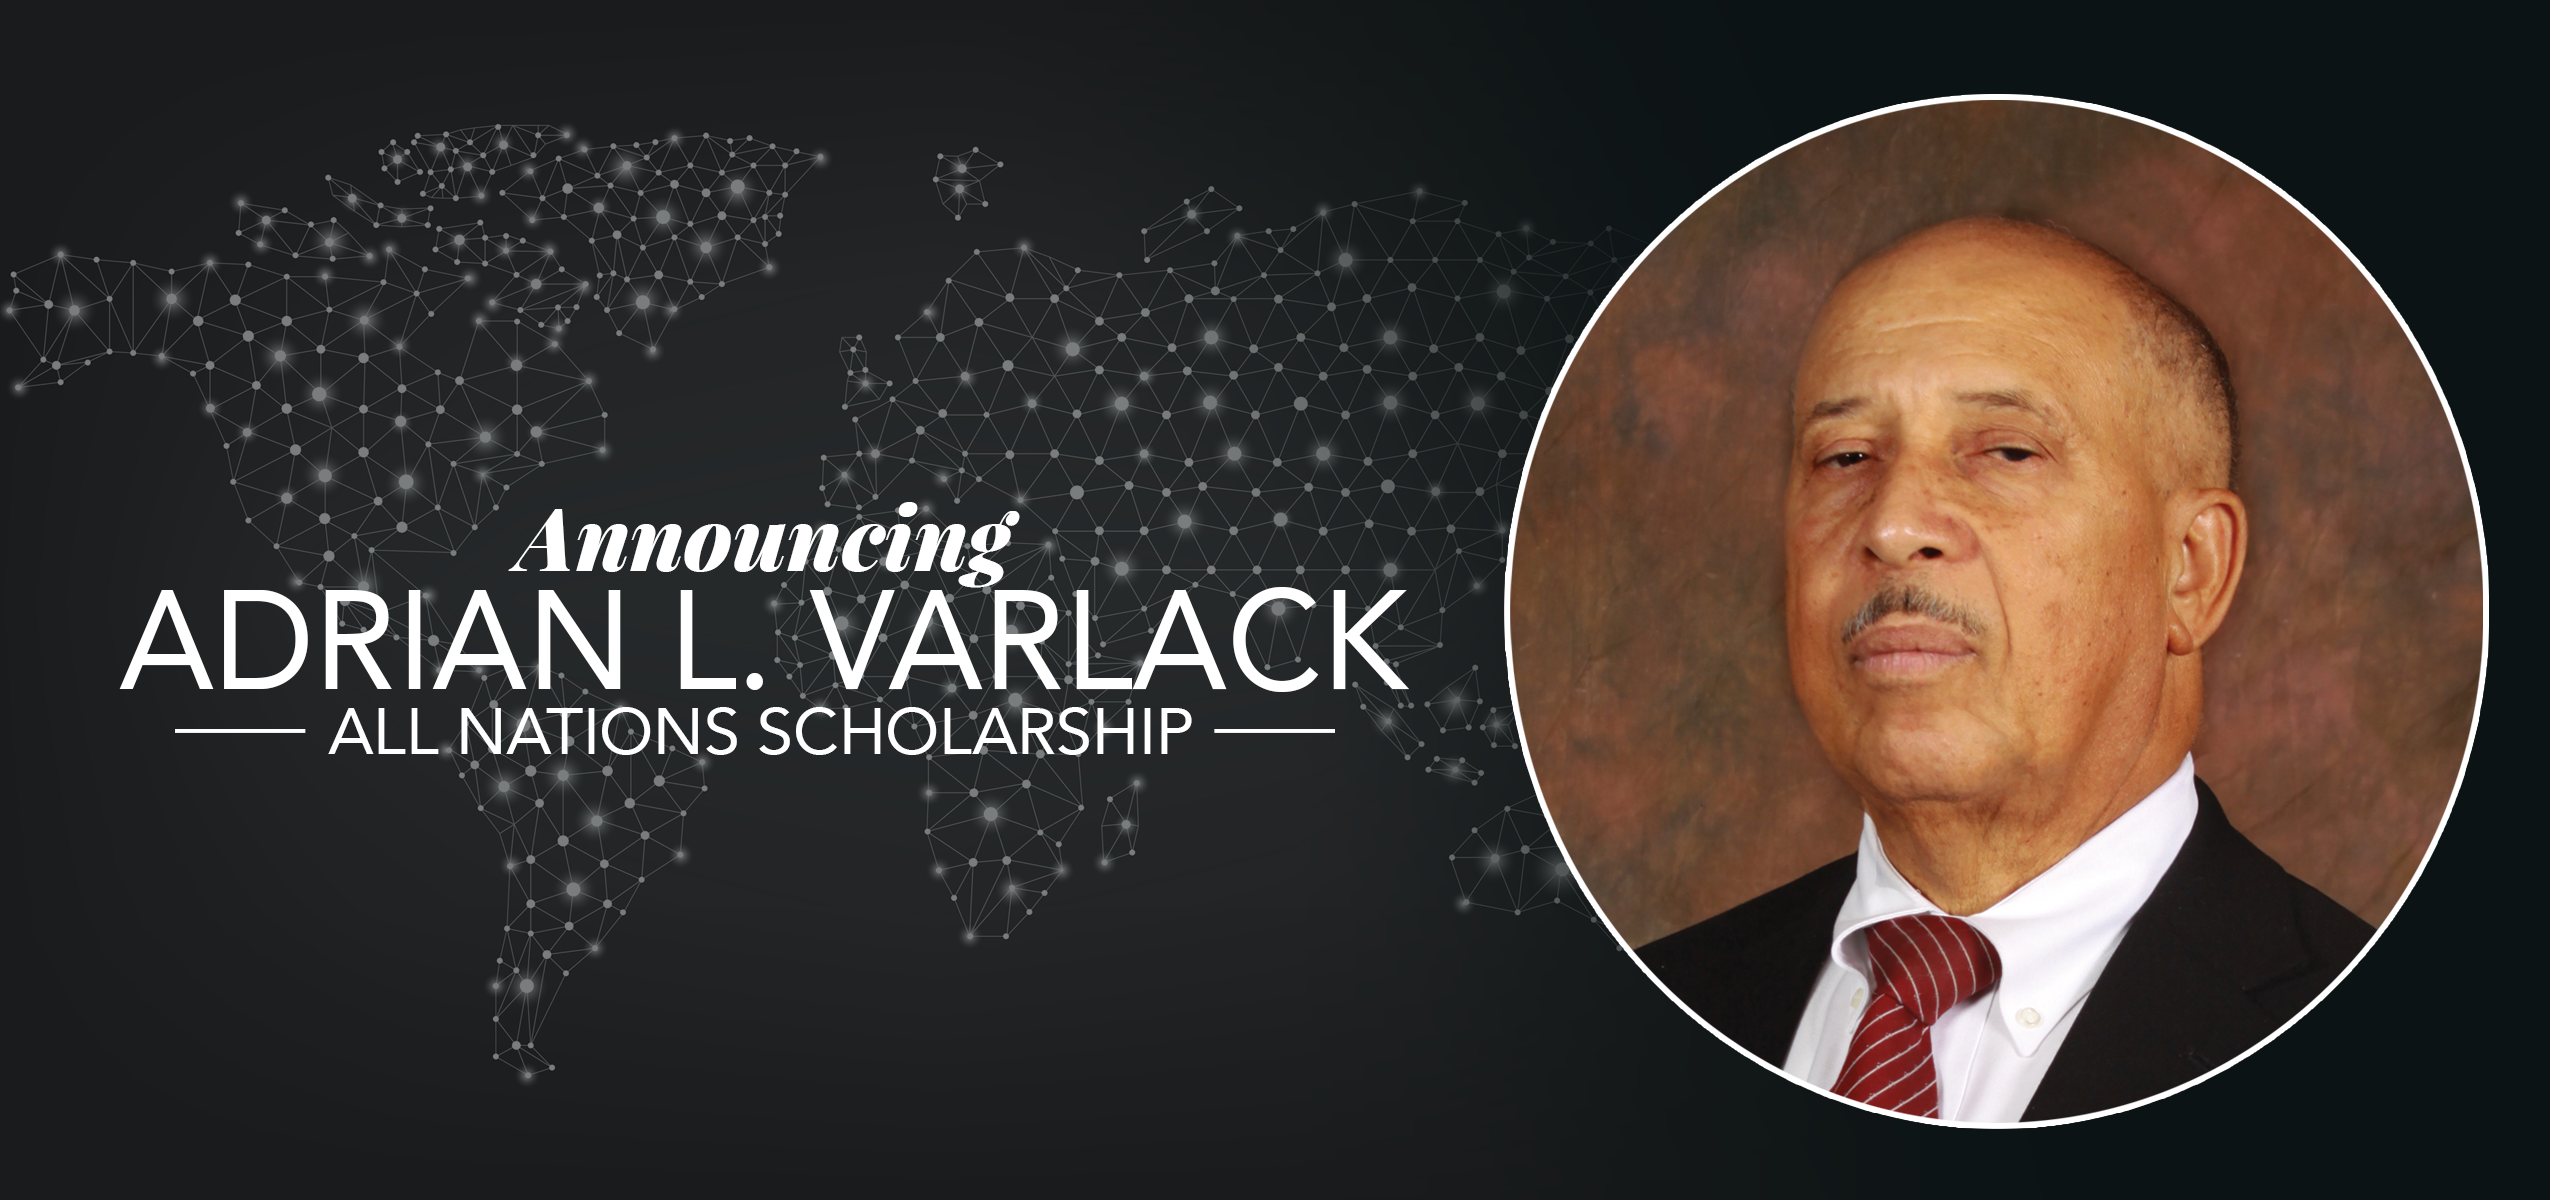 AMD Announces Adrian L. Varlack All Nations Scholarship